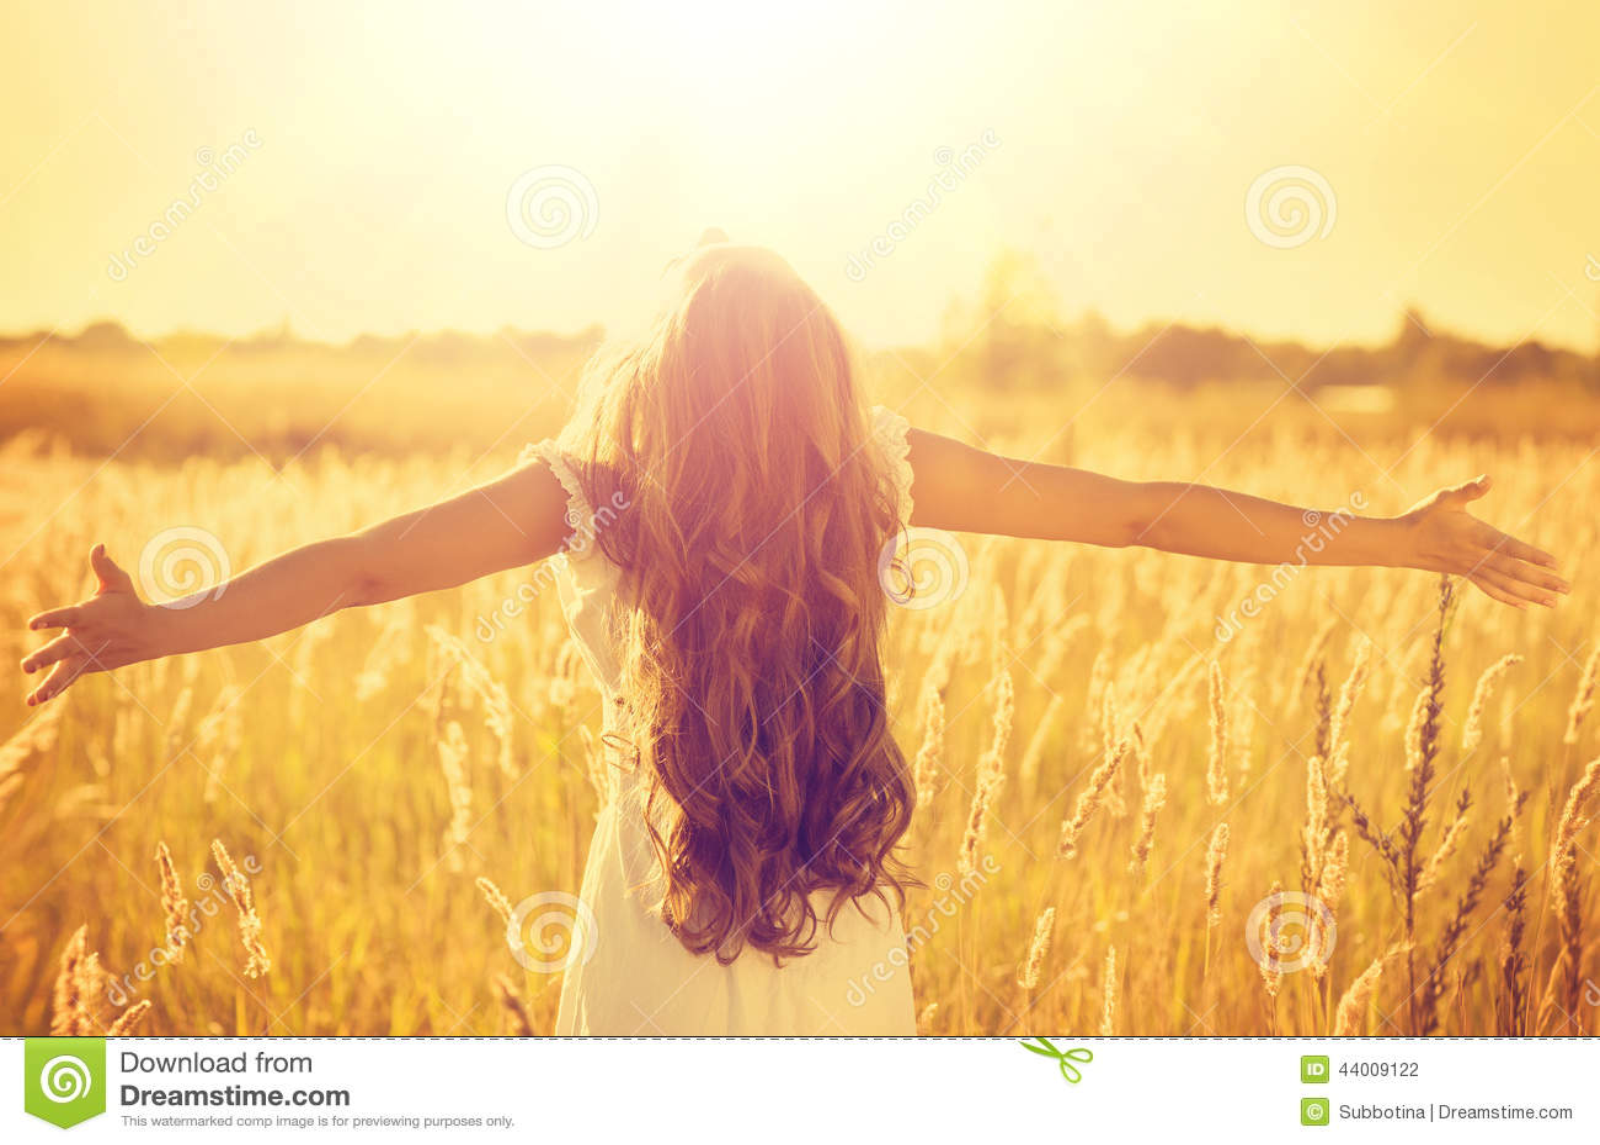 Teenage model girl in white dress enjoying nature